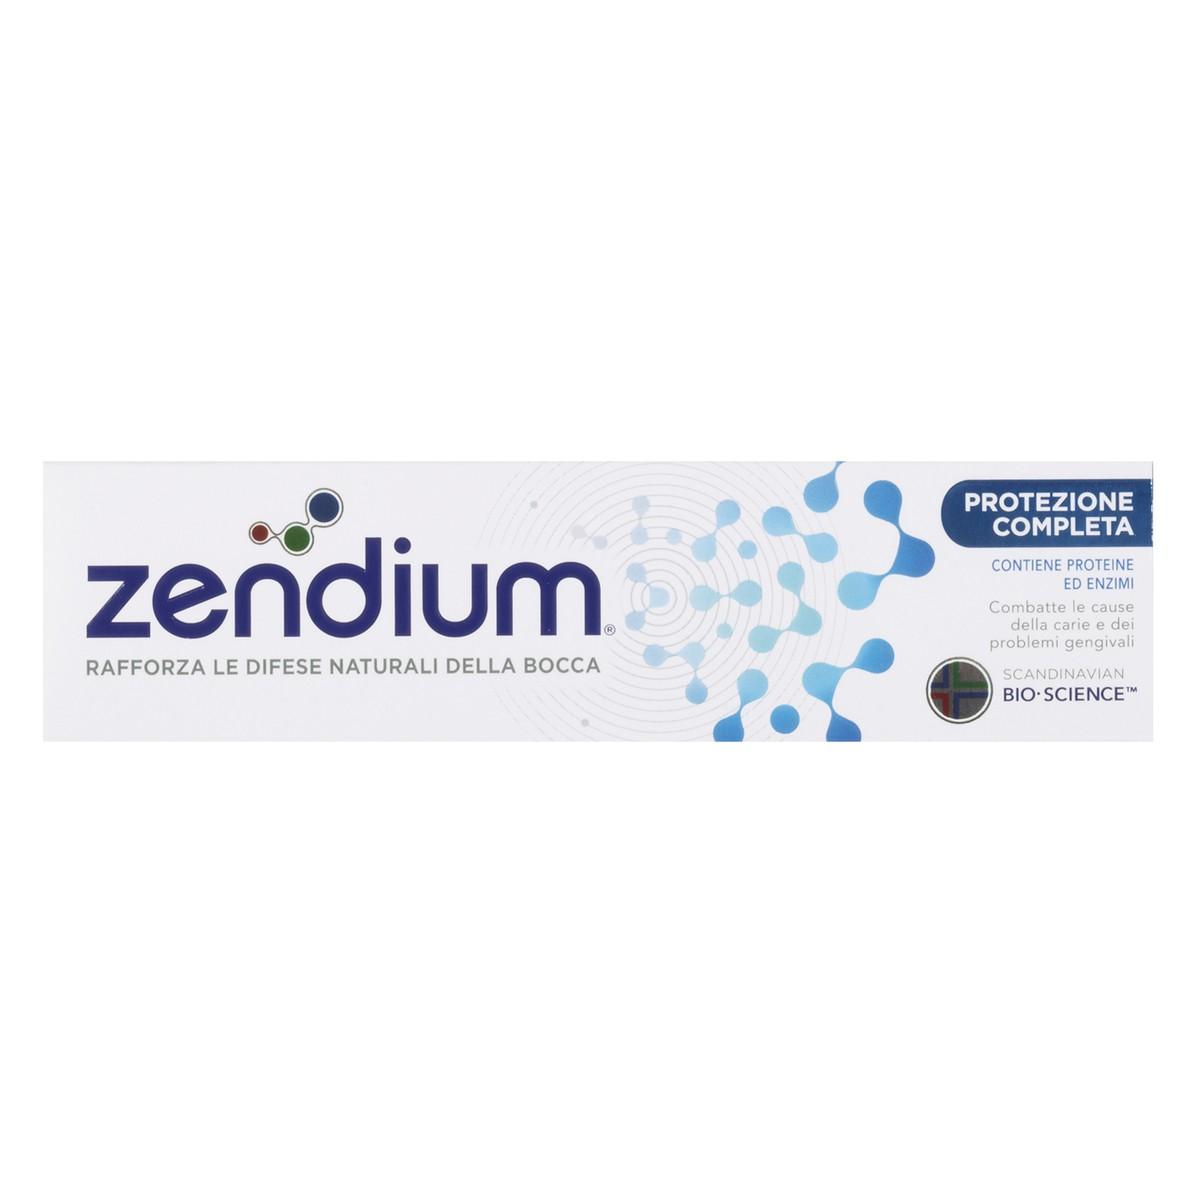 Zendium Dentifricio Complete Protection